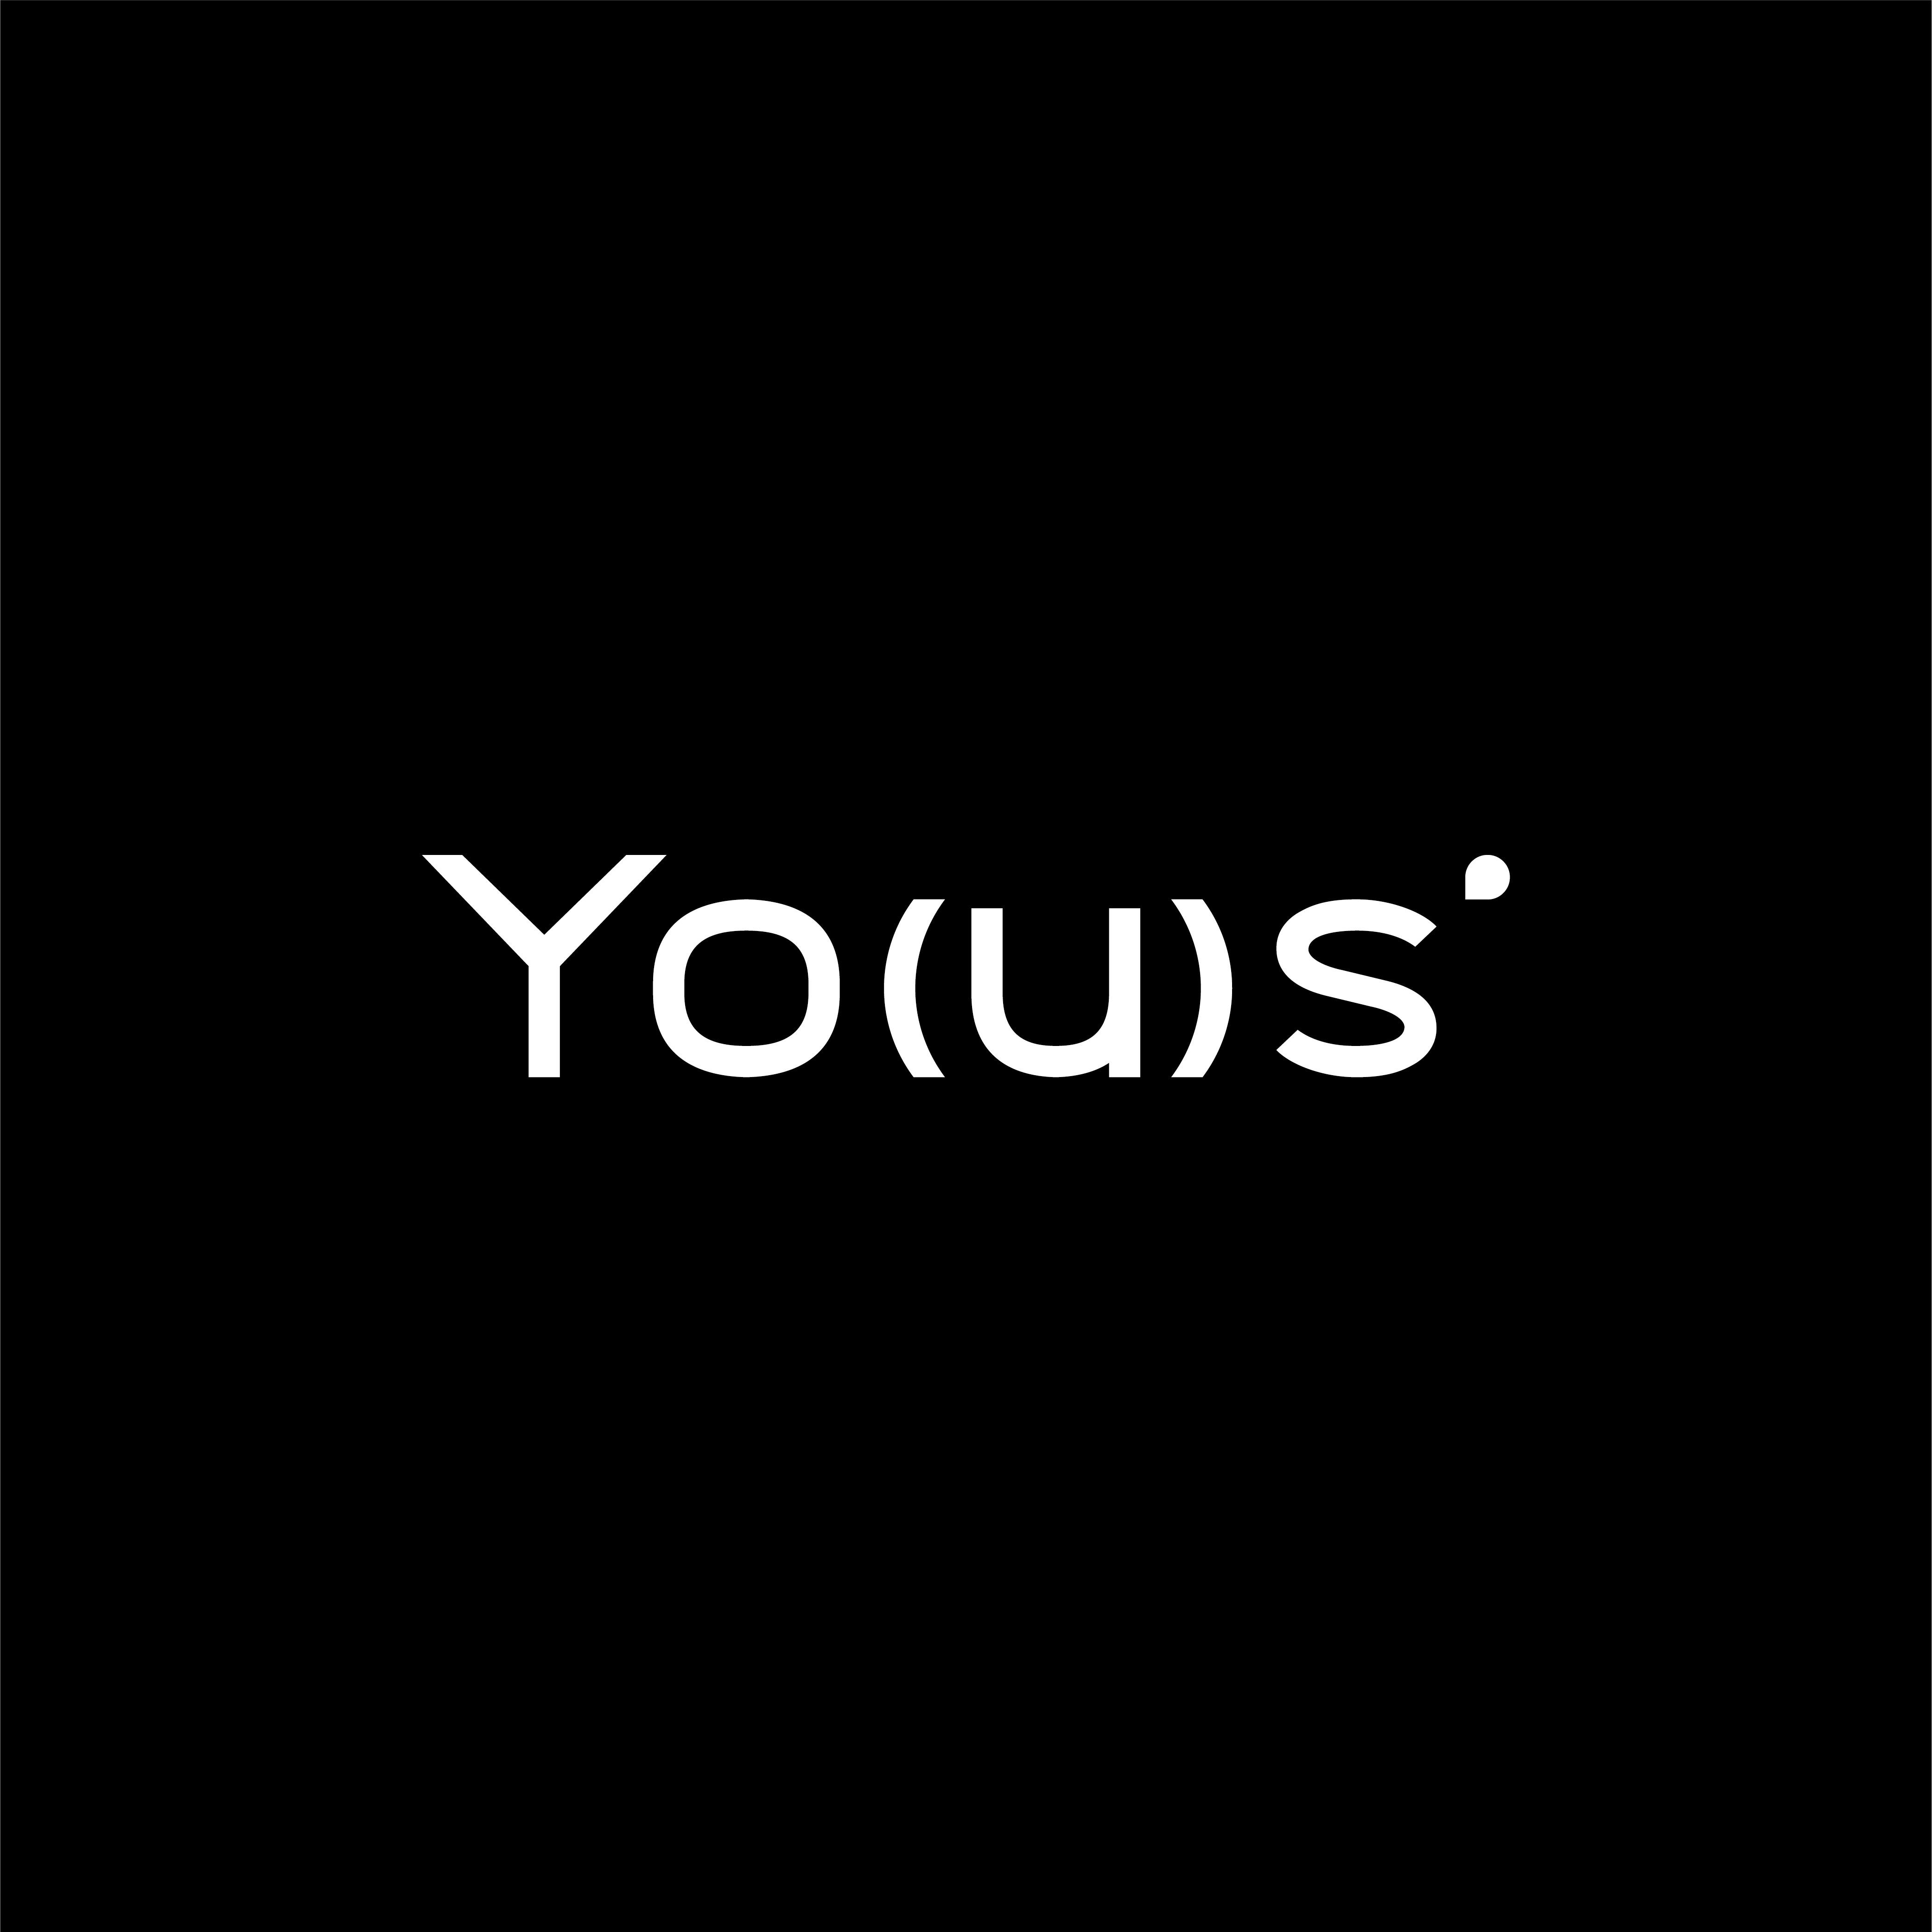 Yo(u)s' / ヨウズのネーミングについて